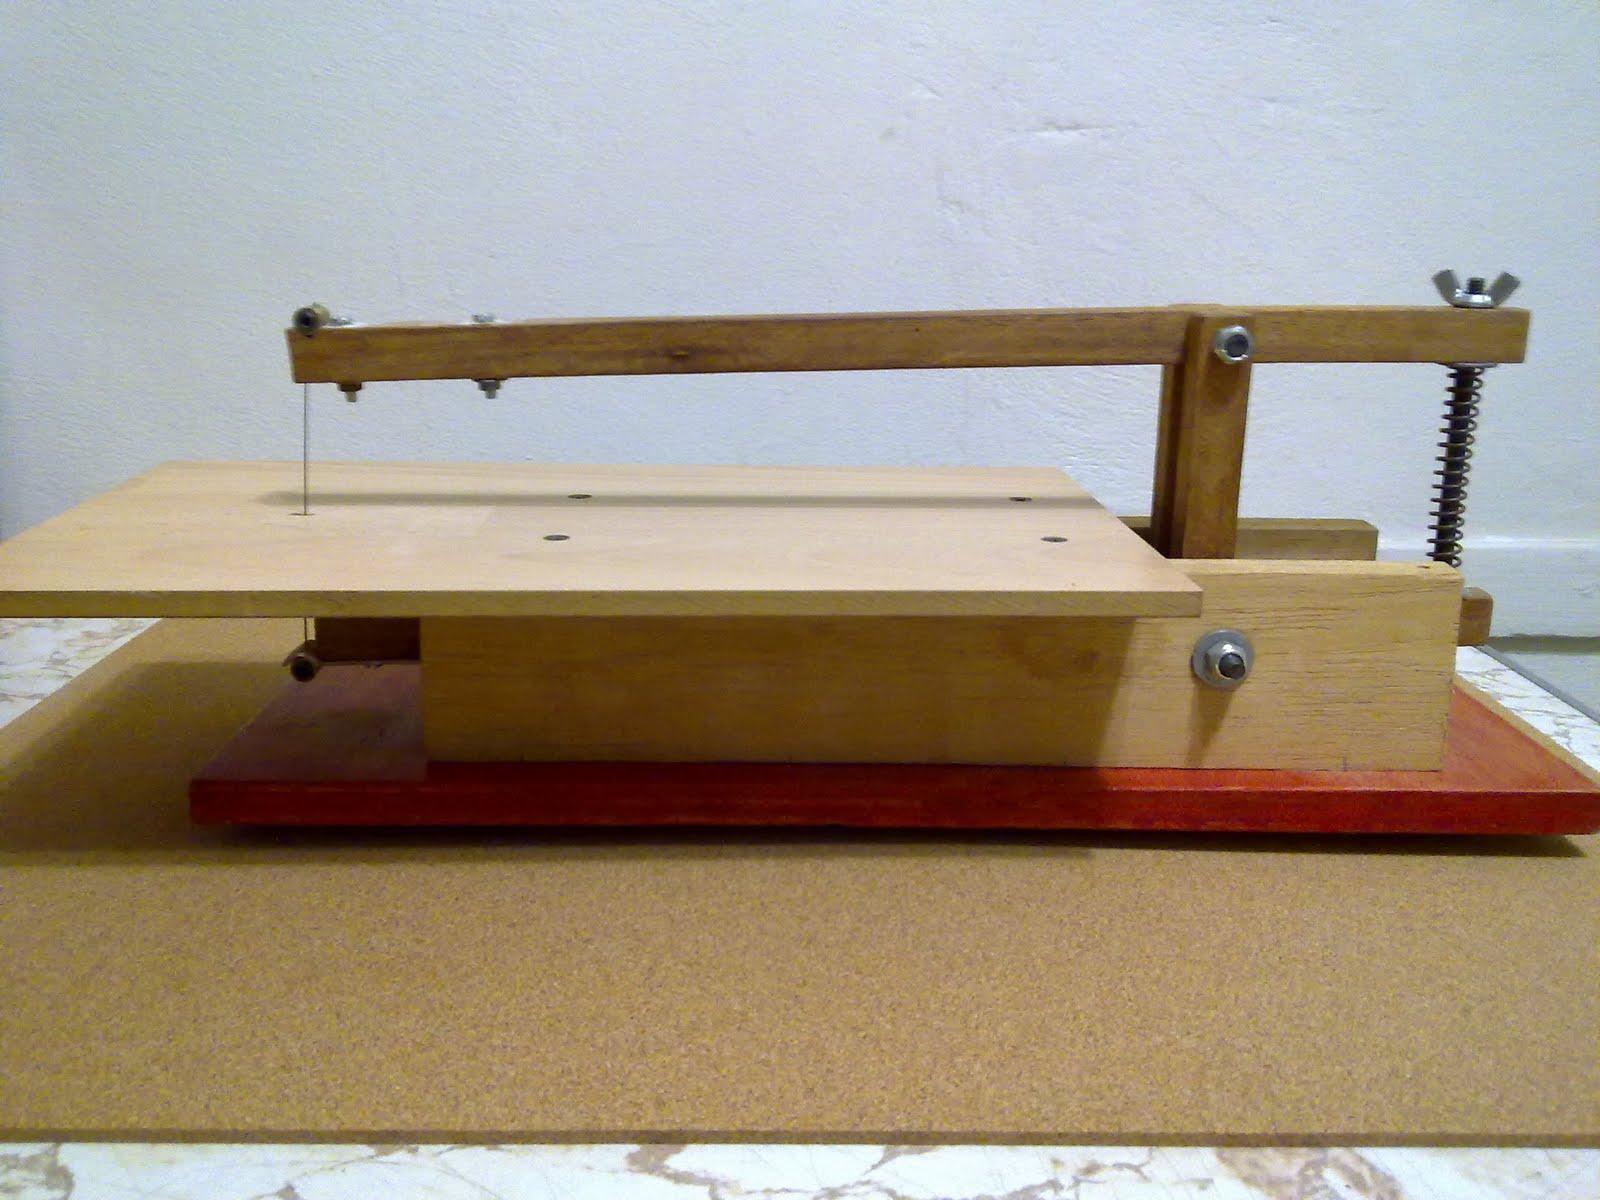 Creando con madera sierra para marqueter a - Casas de marqueteria ...